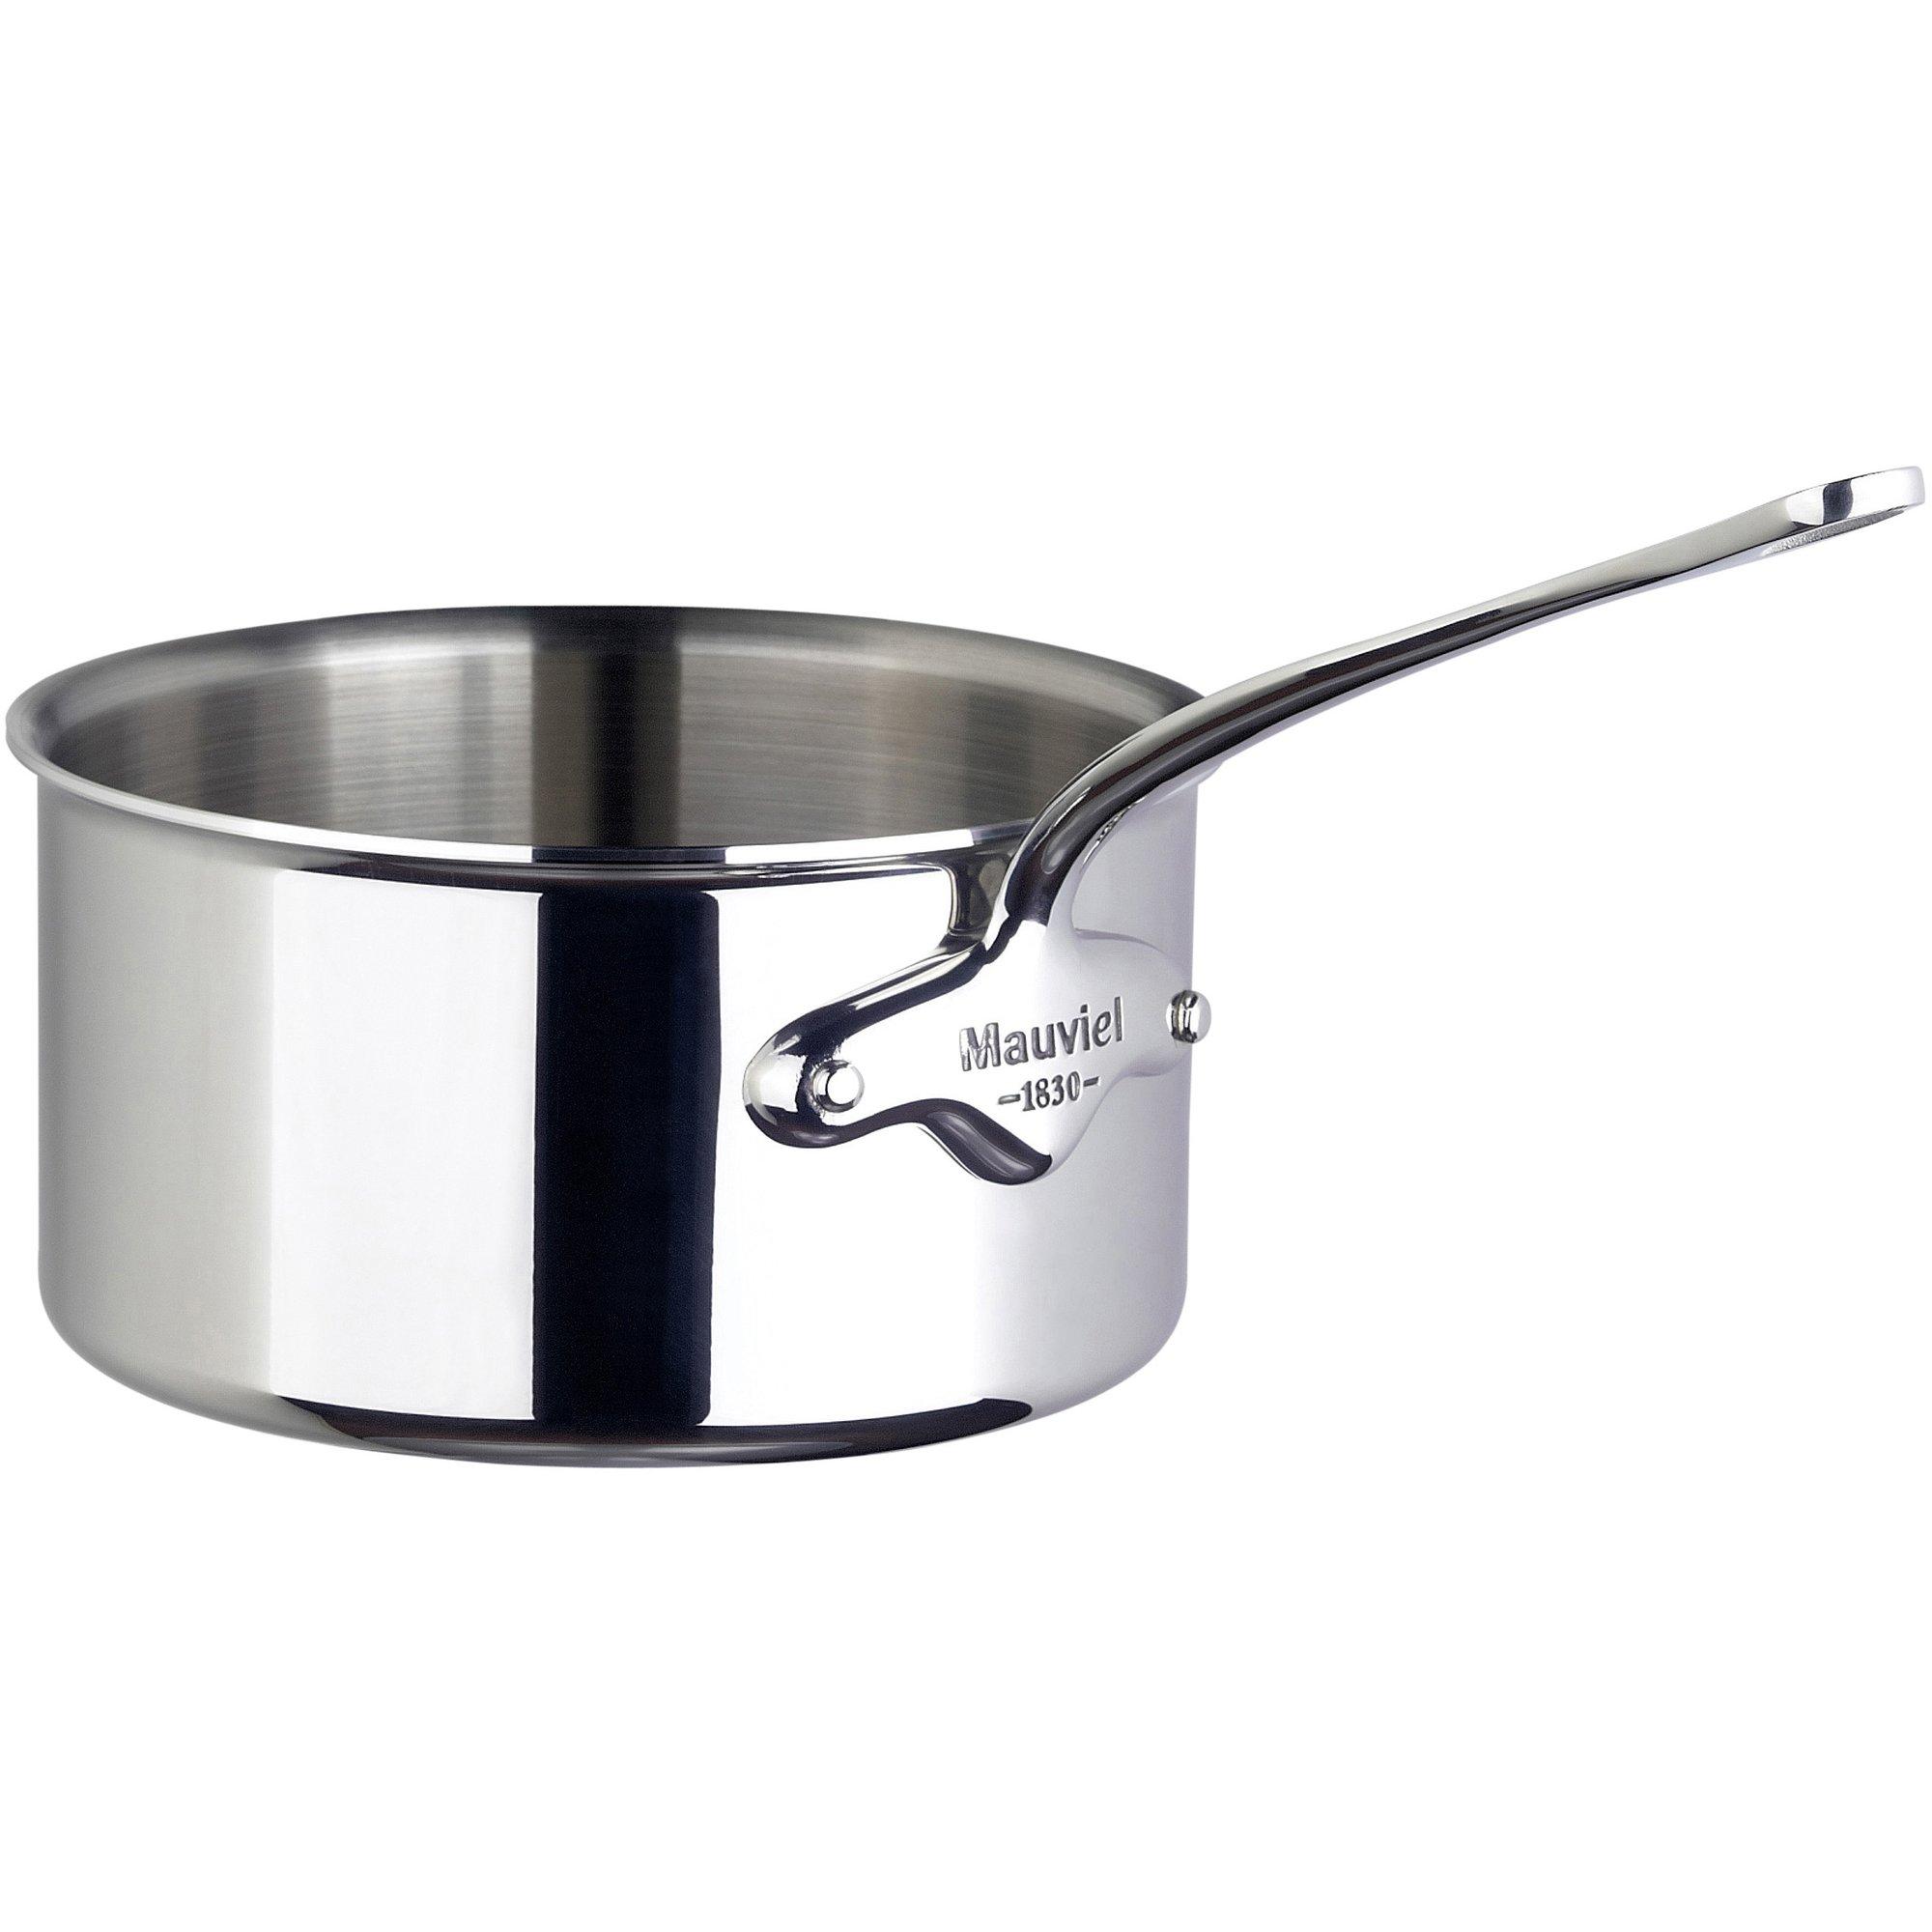 Mauviel Cook Style kastrull i stål 08 liter